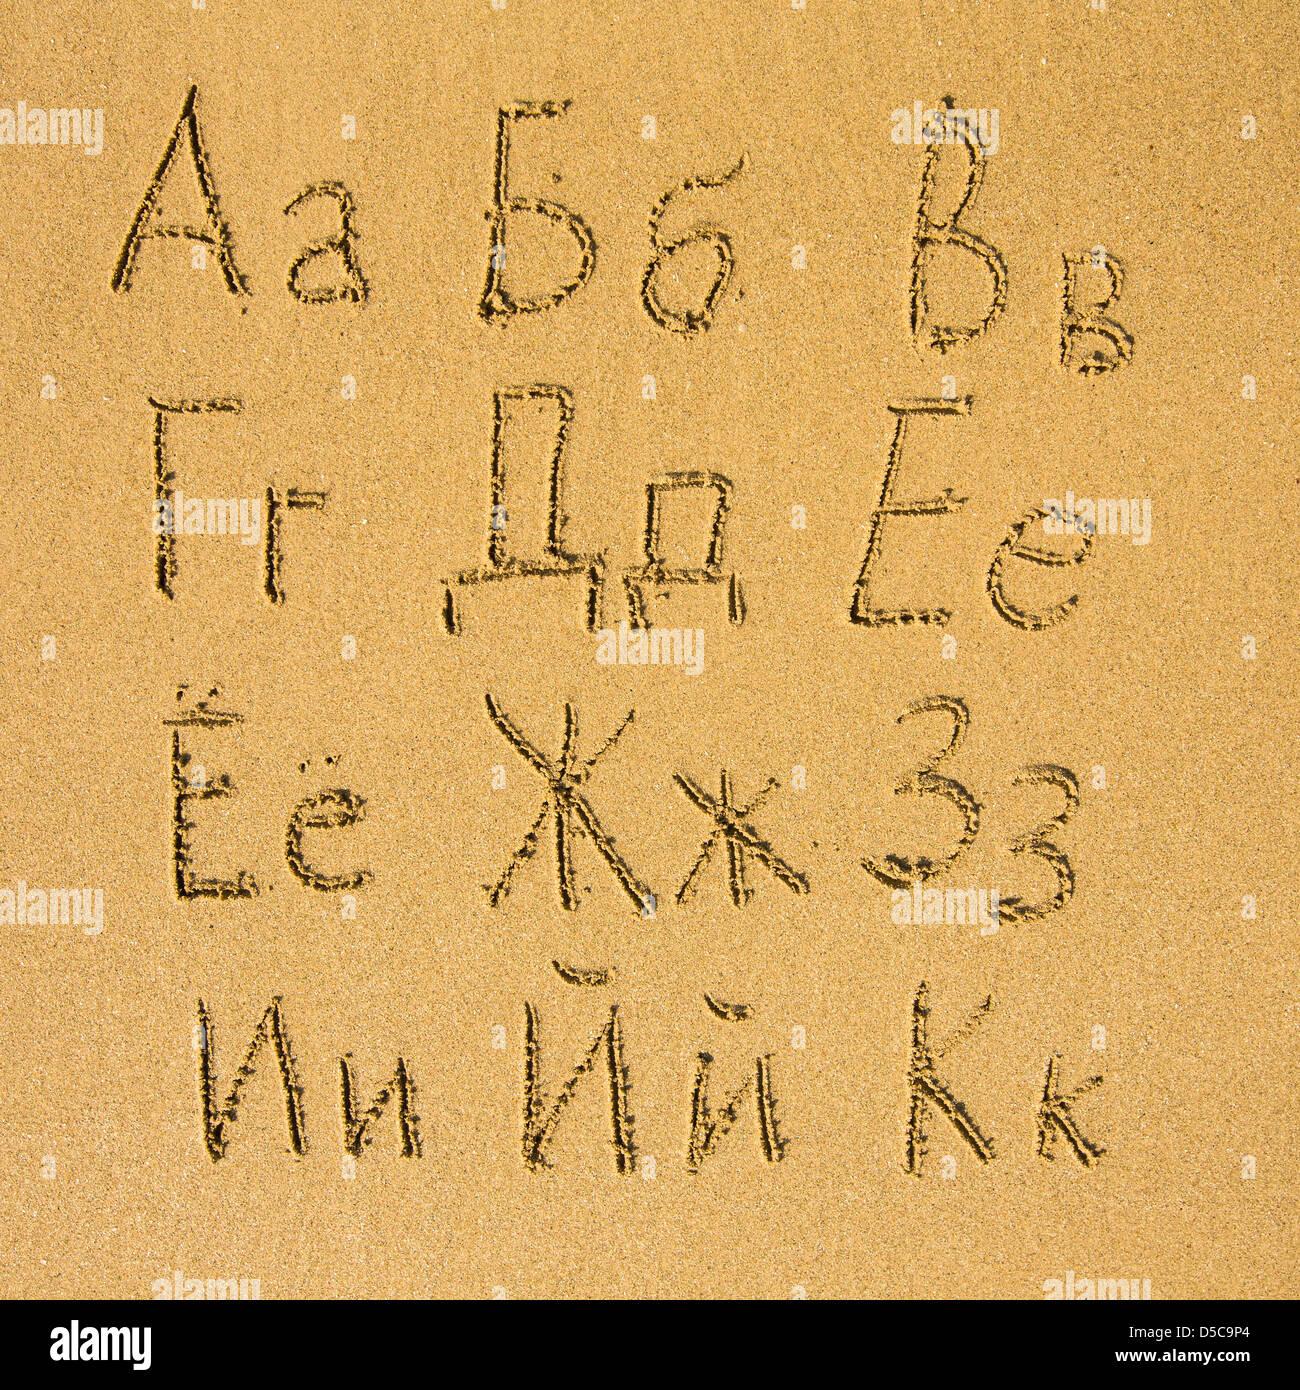 Russian Alphabet Stock Photos & Russian Alphabet Stock Images - Alamy